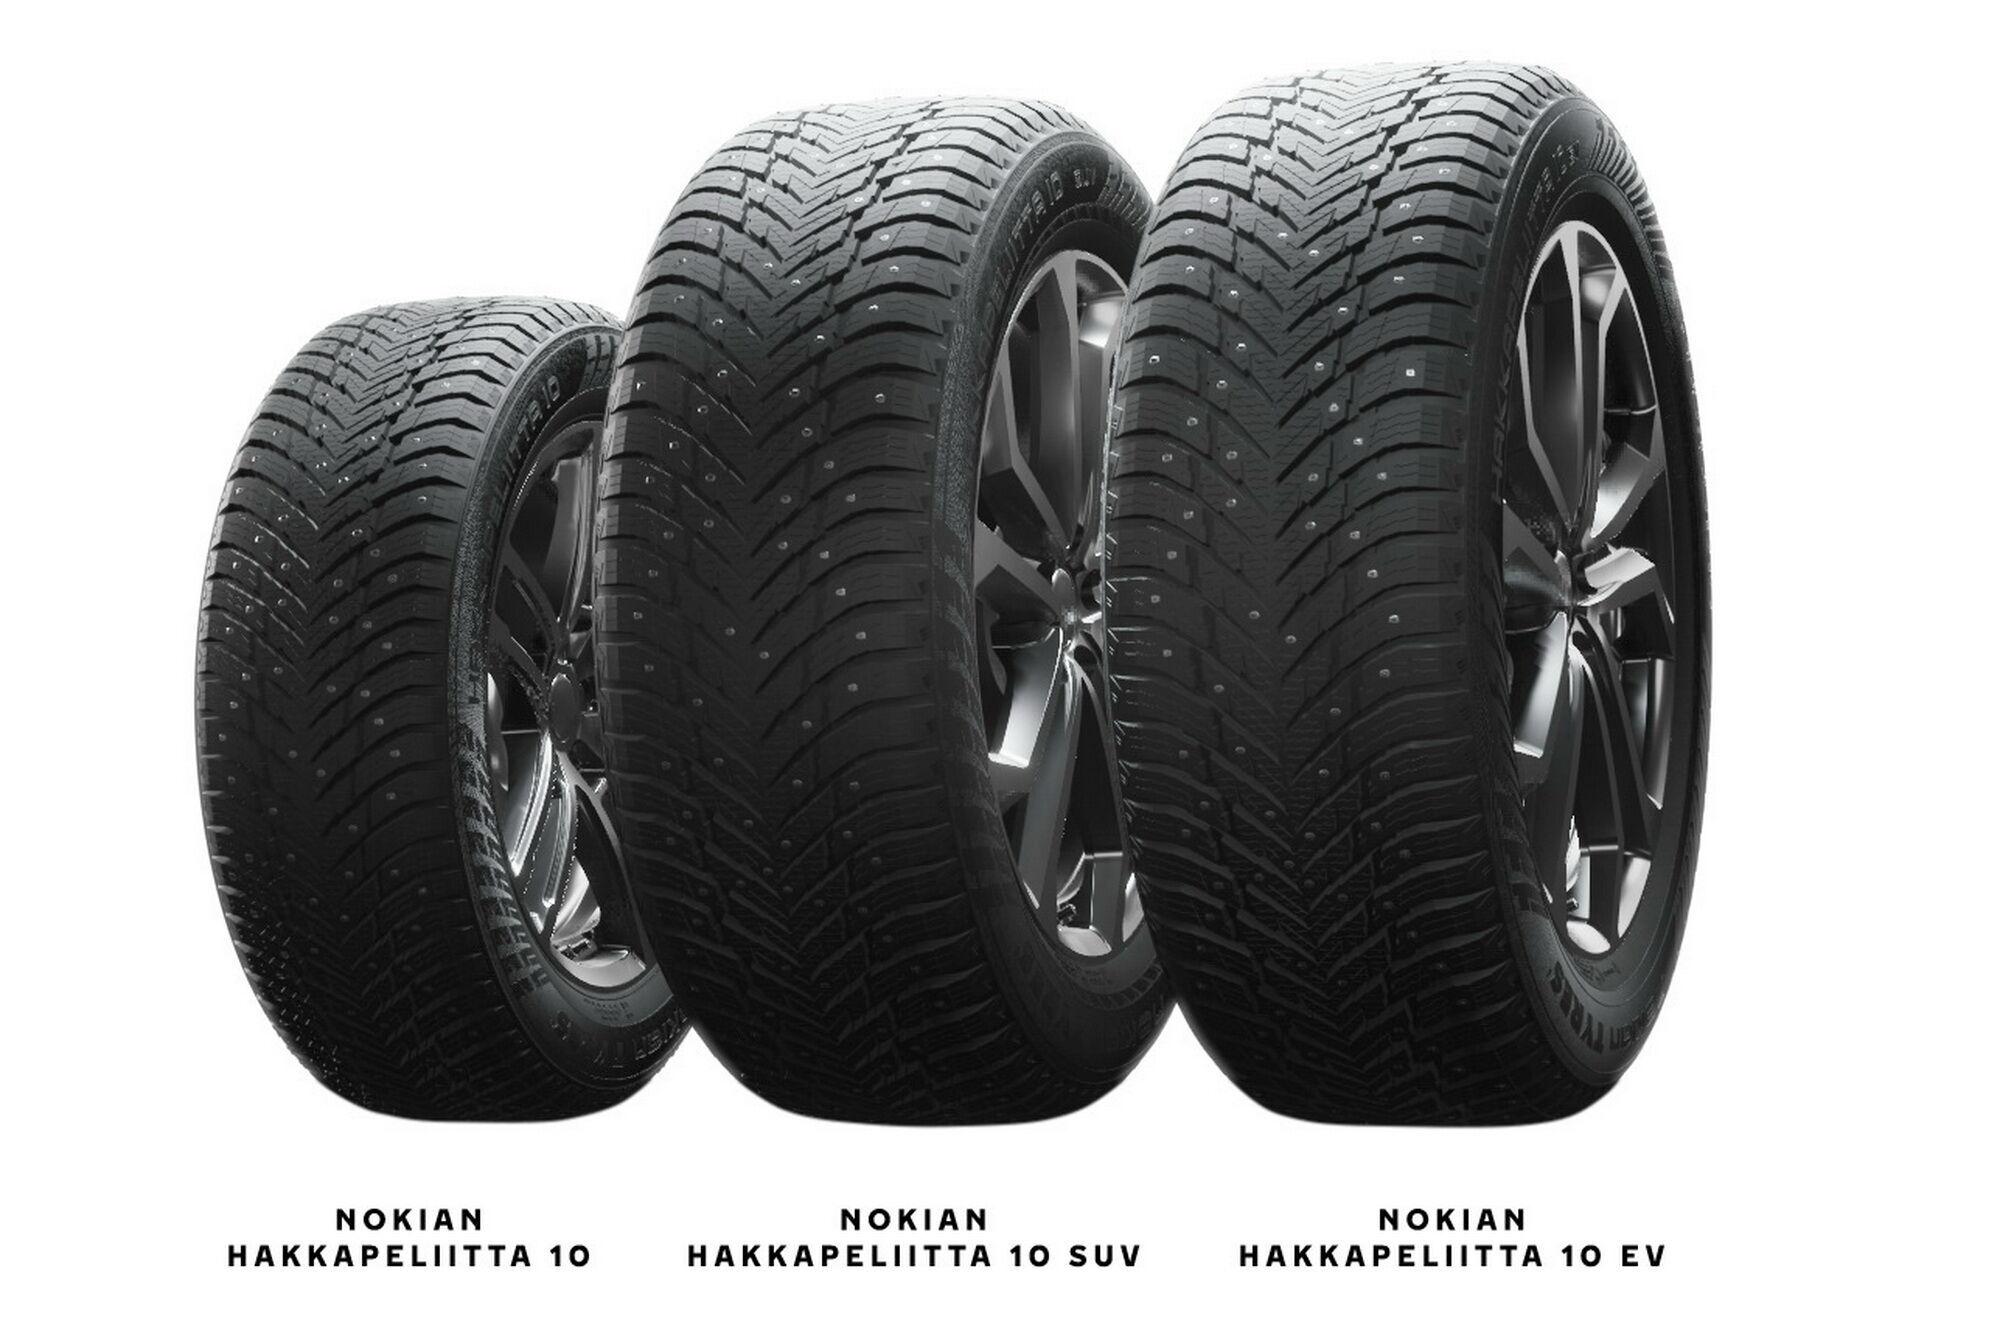 Cемейство шин Nokian Hakkapeliitta 10 представлено тремя моделями